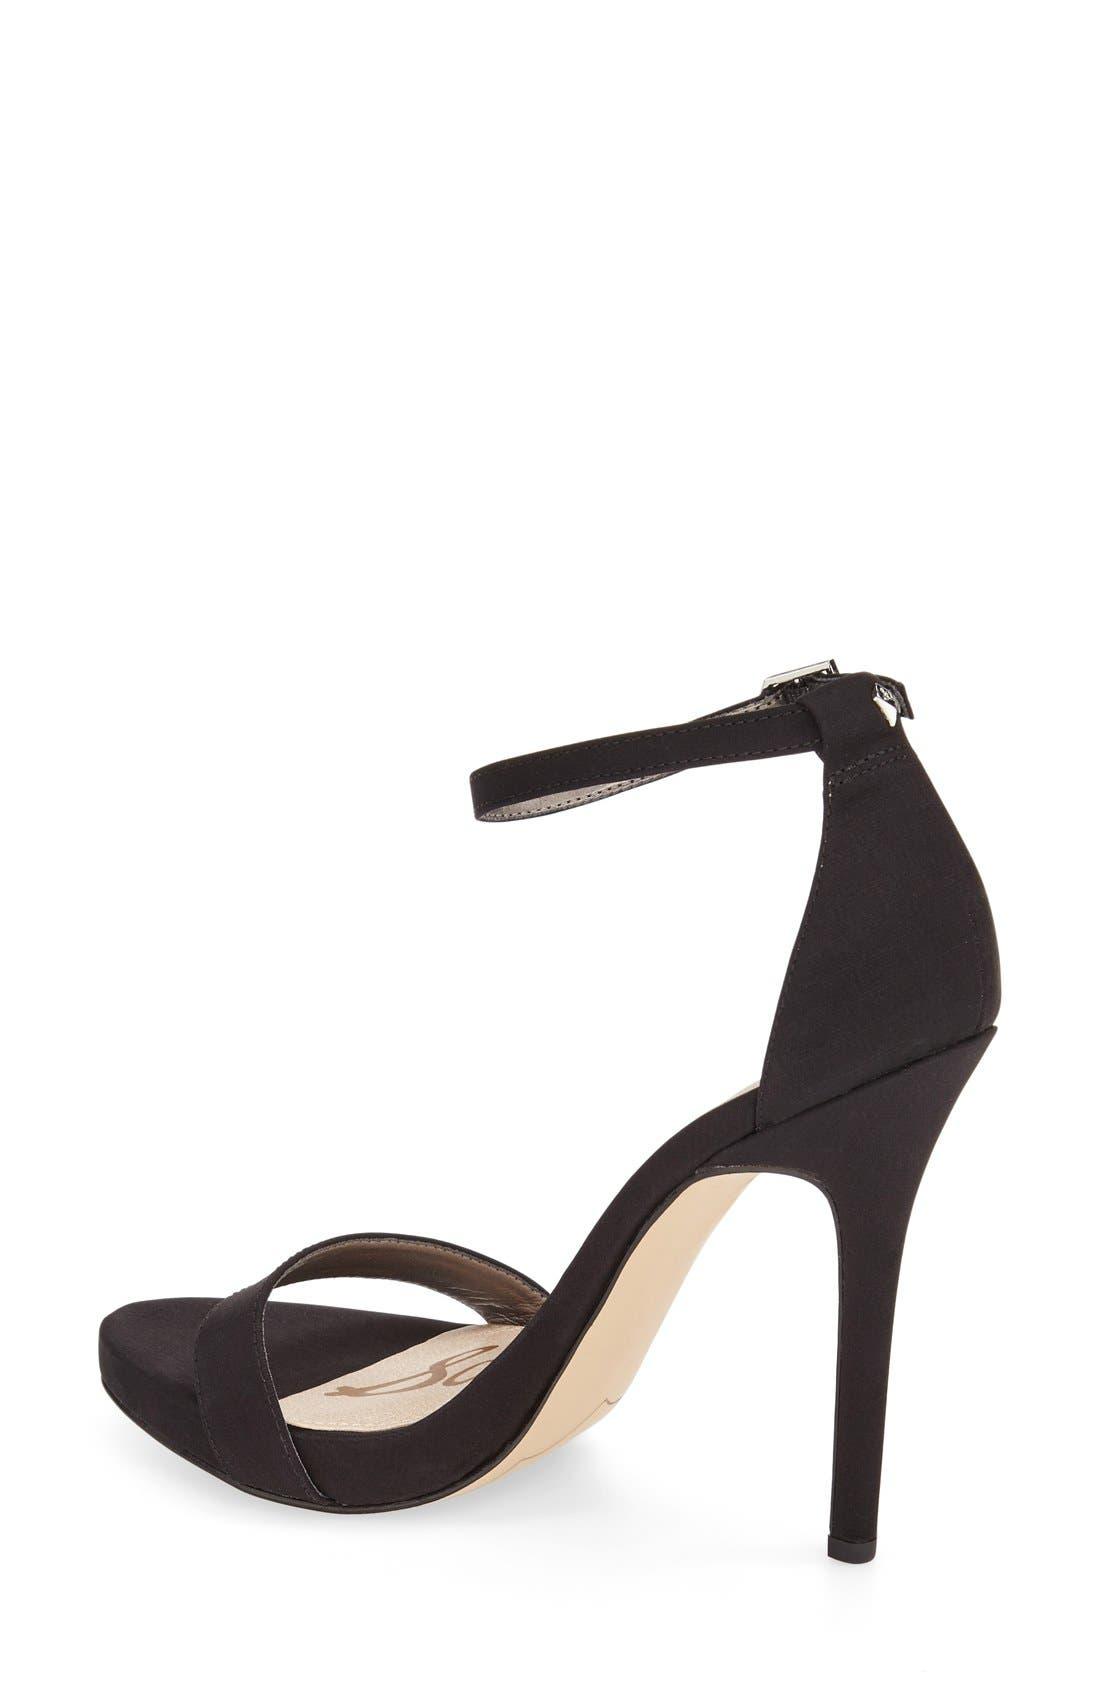 ,                             'Eleanor' Ankle Strap Sandal,                             Alternate thumbnail 34, color,                             006